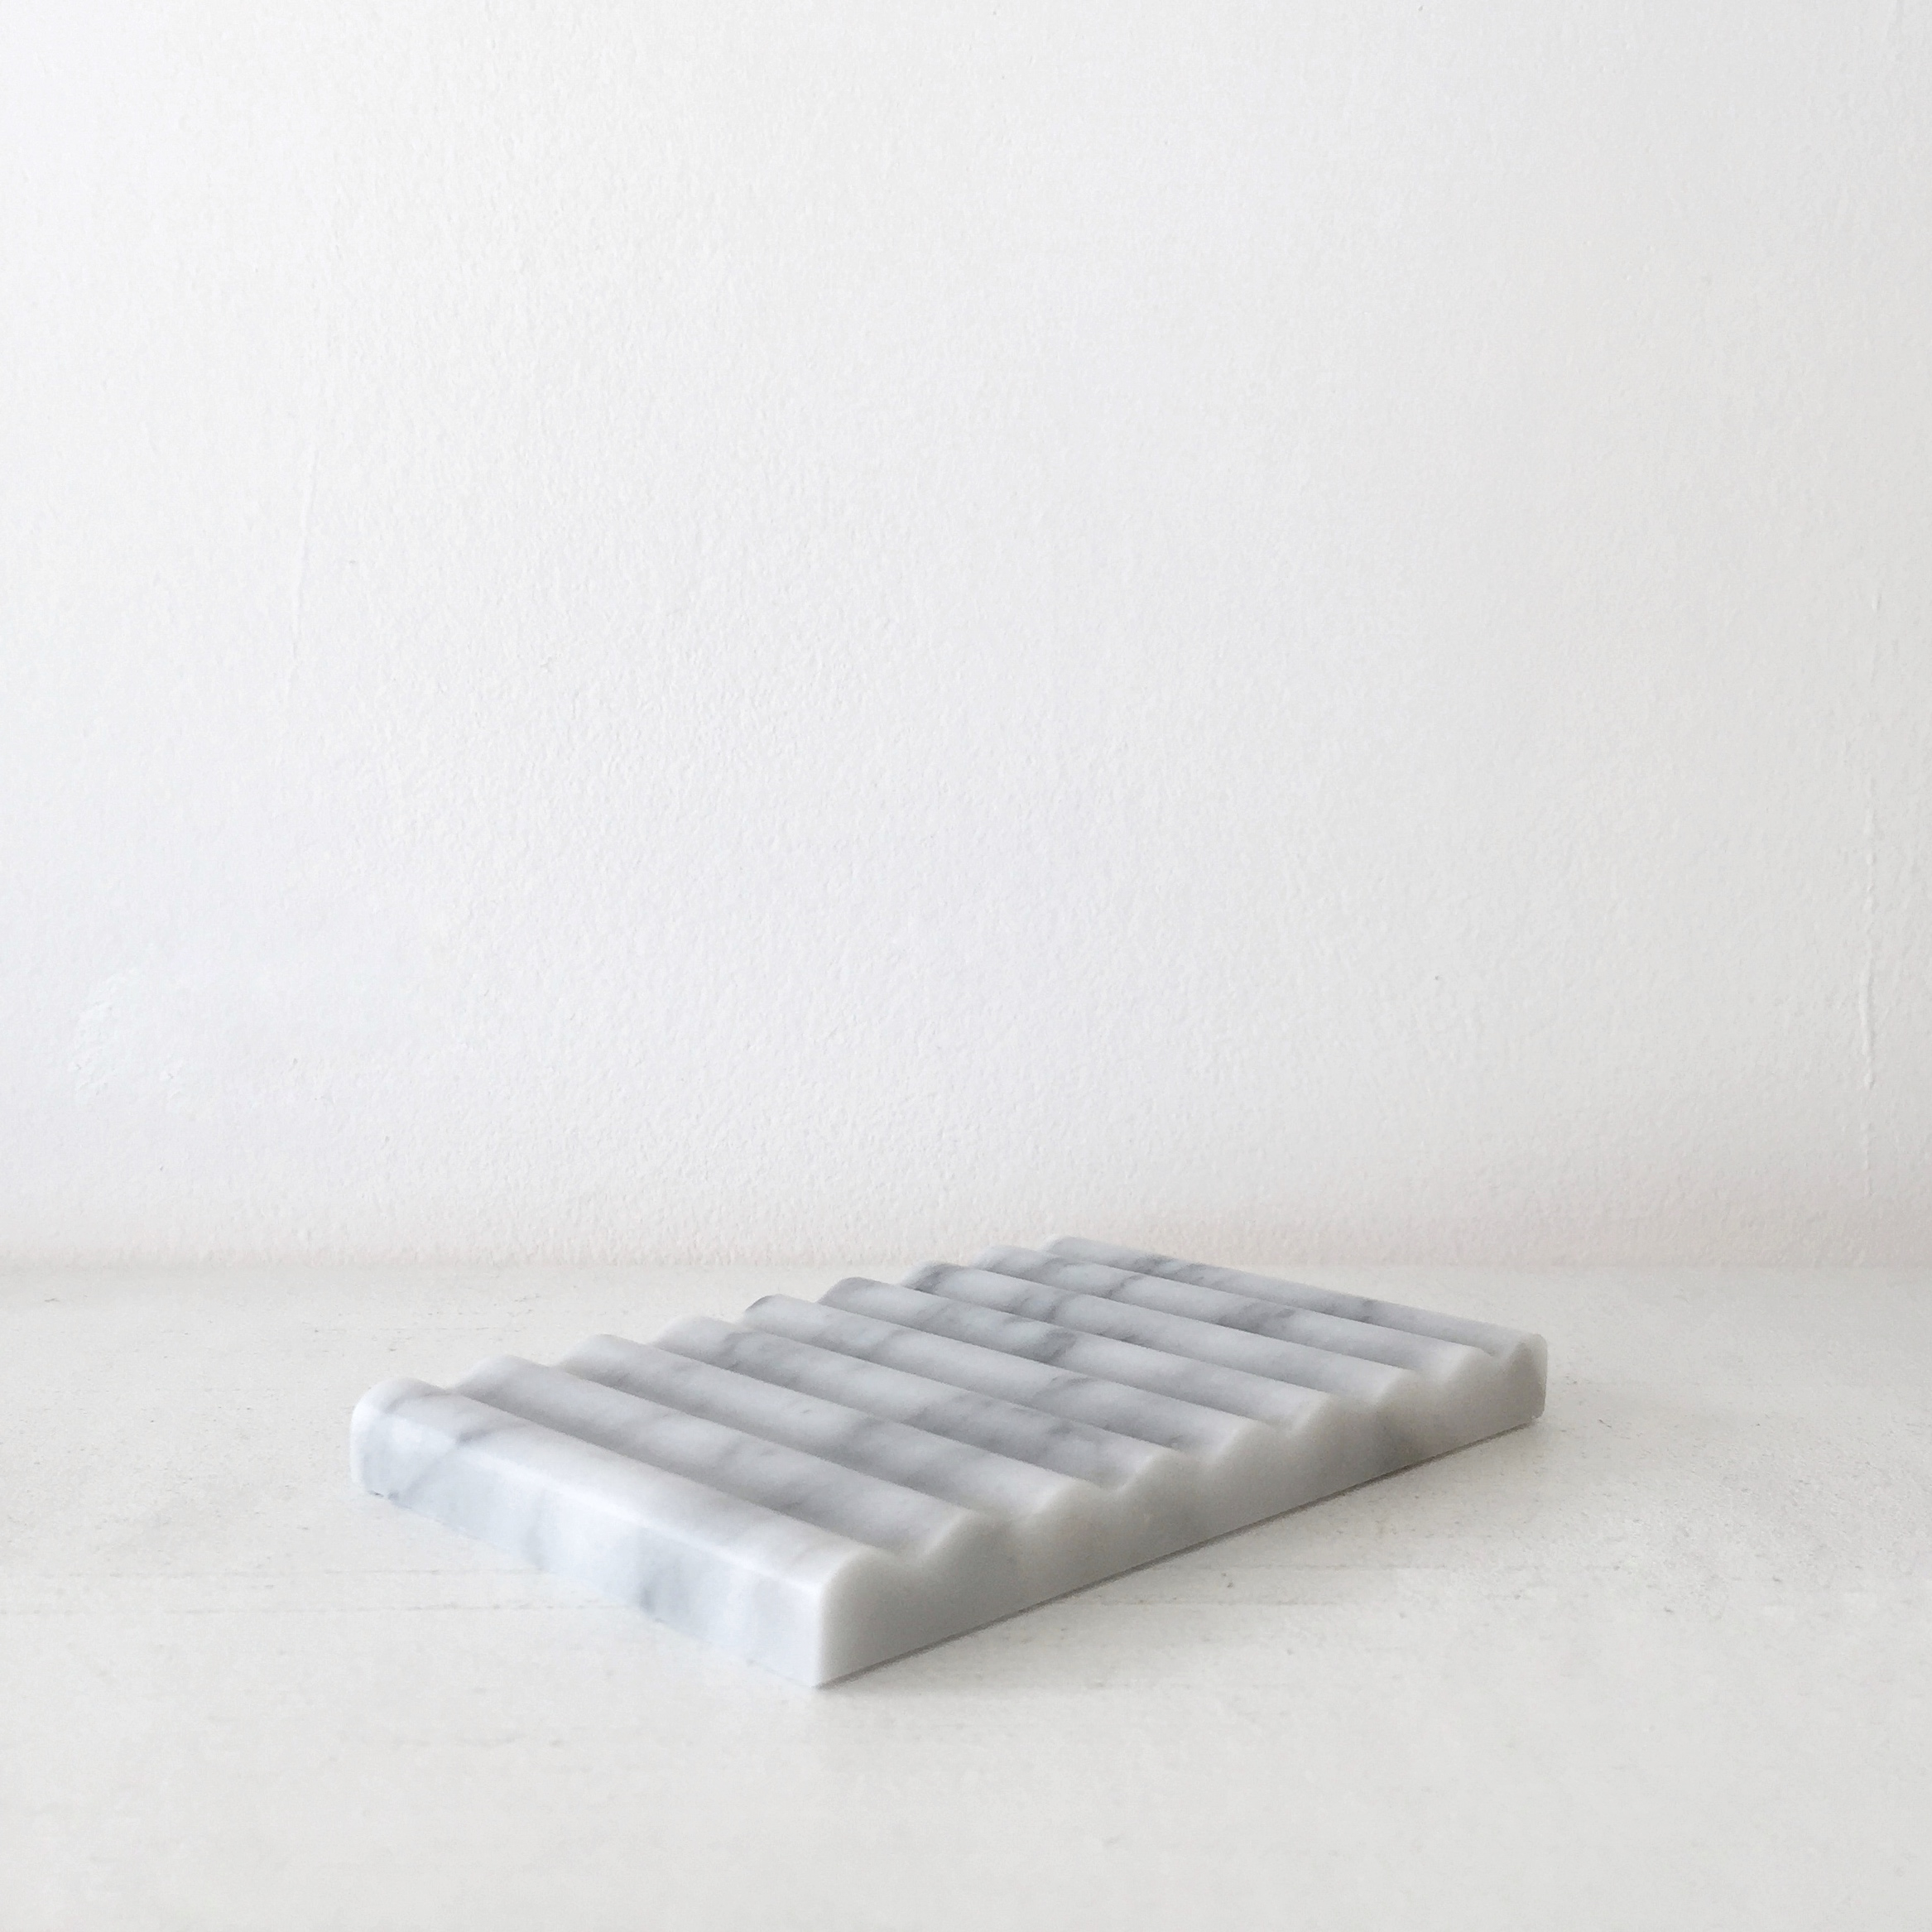 Binu Binu Soap Dish Carrara Marble